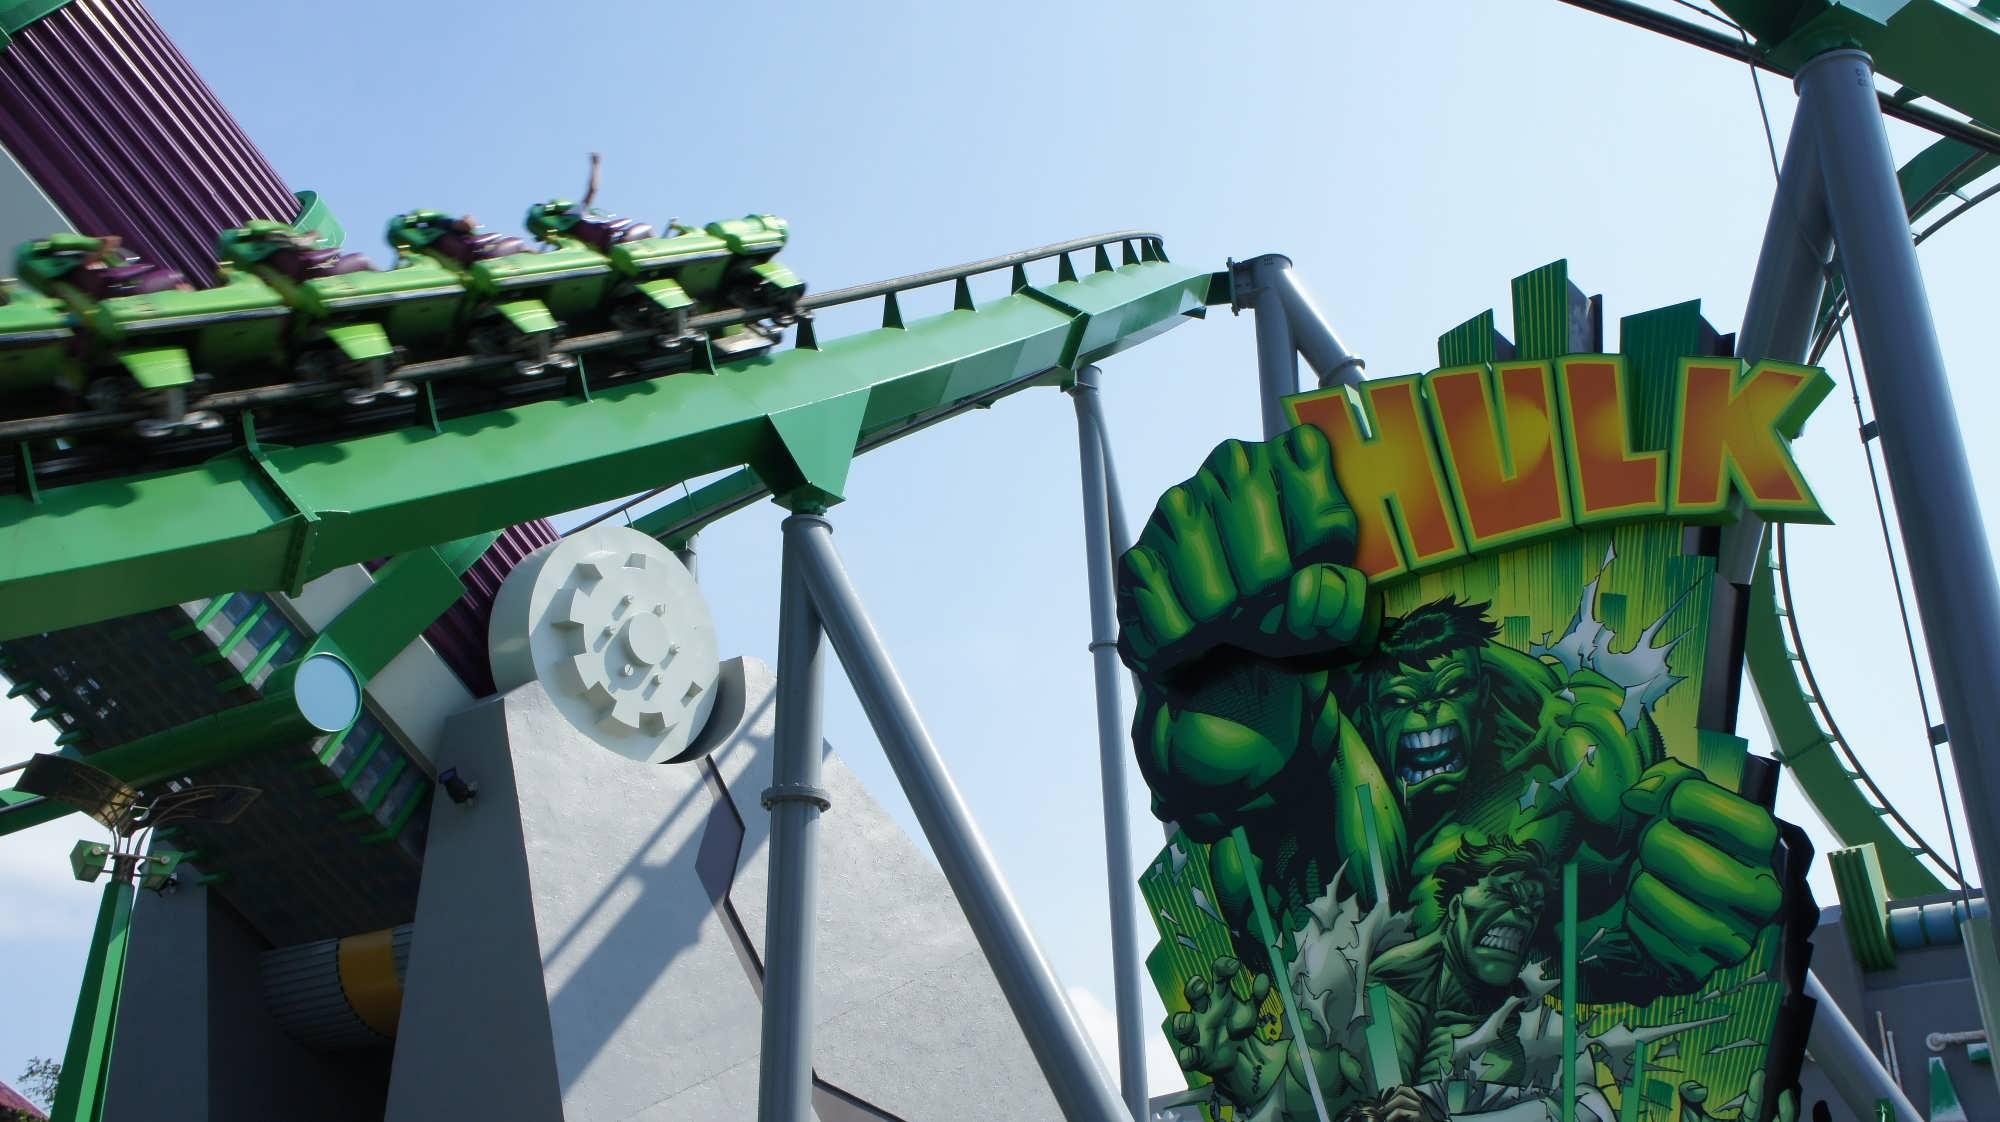 Incredible Hulk Coaster overhaul confirmed